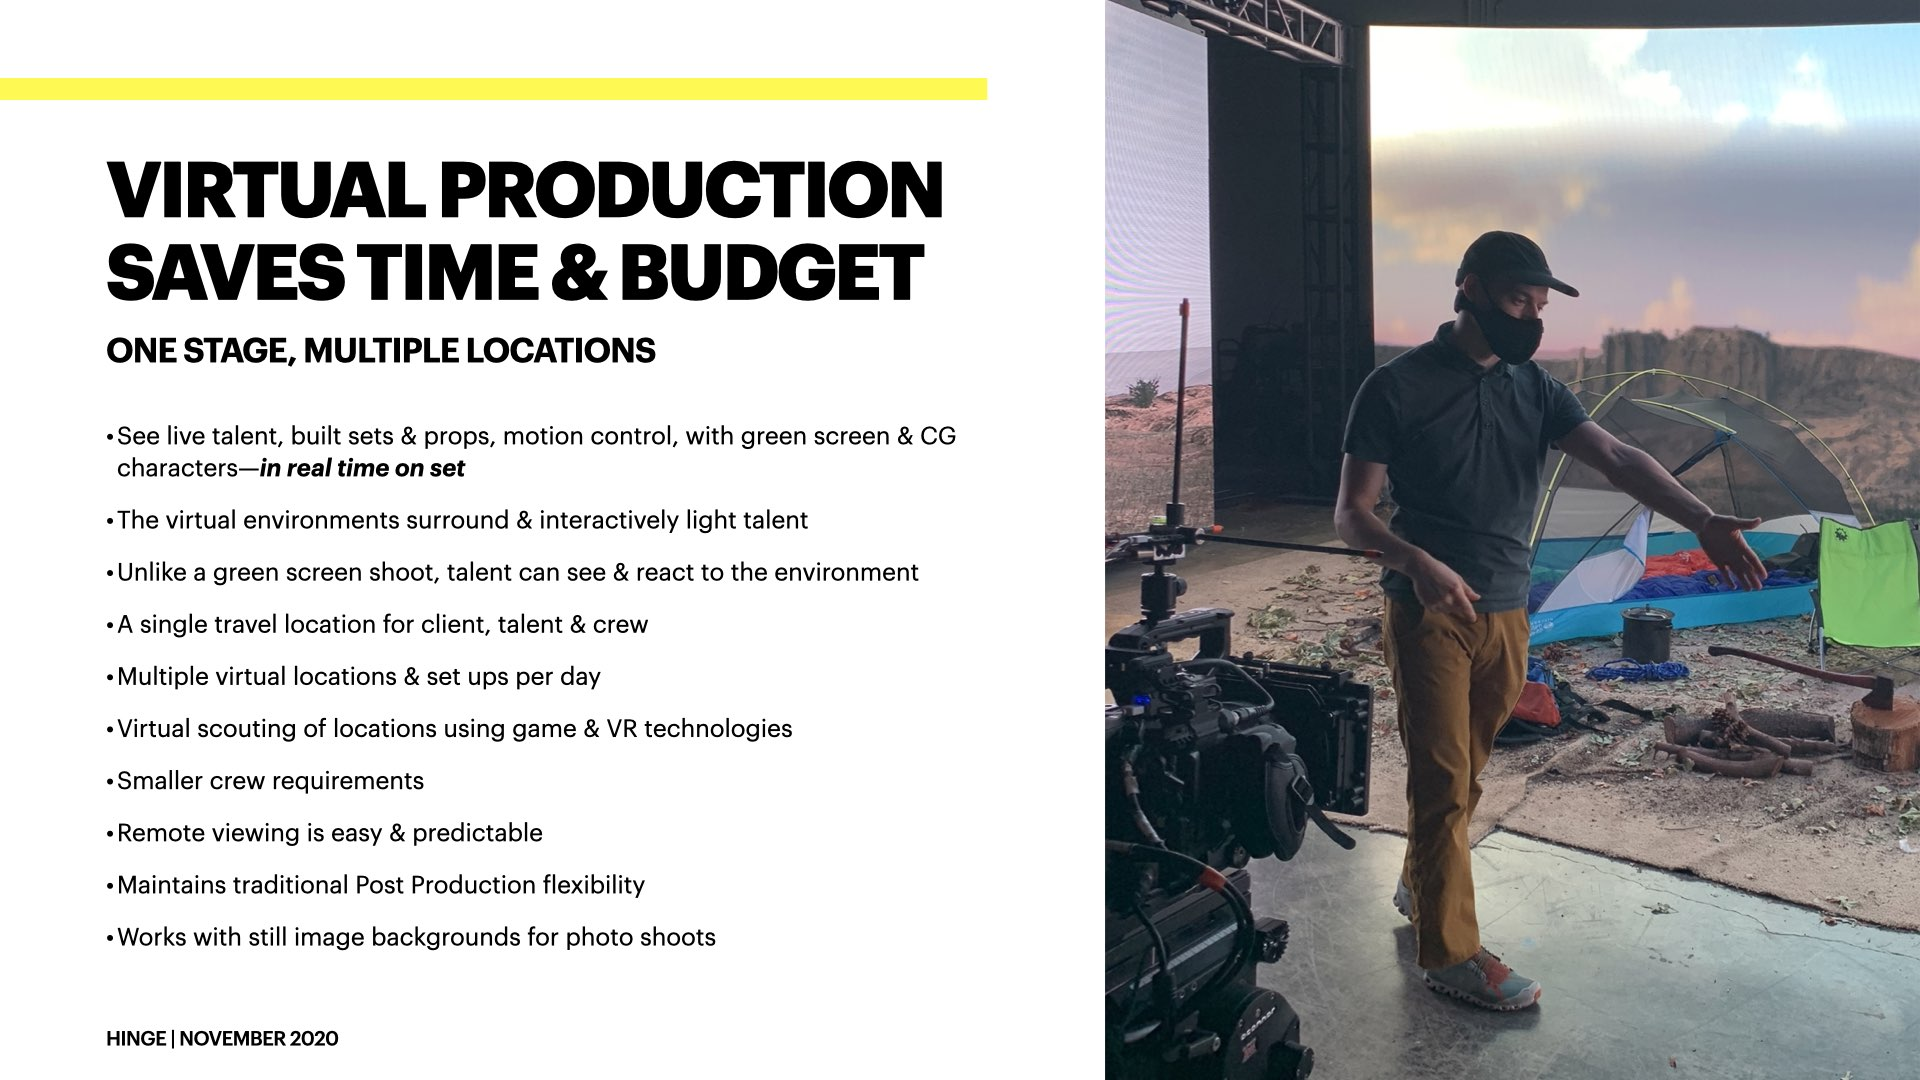 Hinge_Virtual_Production_08